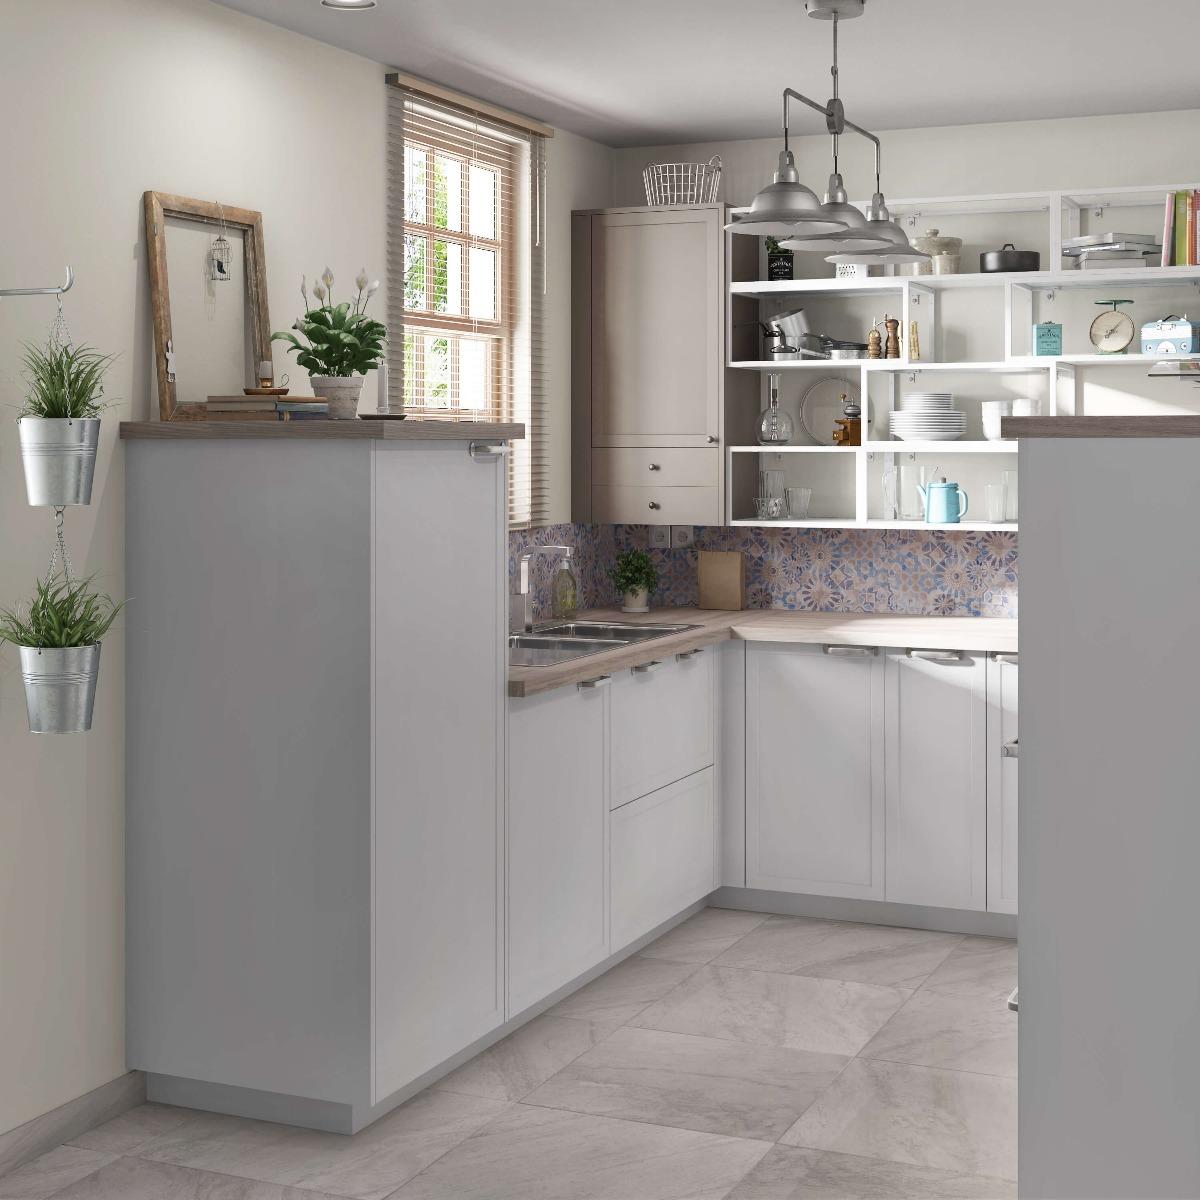 Delinia Newport White Designer Kitchen Mobi - Example 3